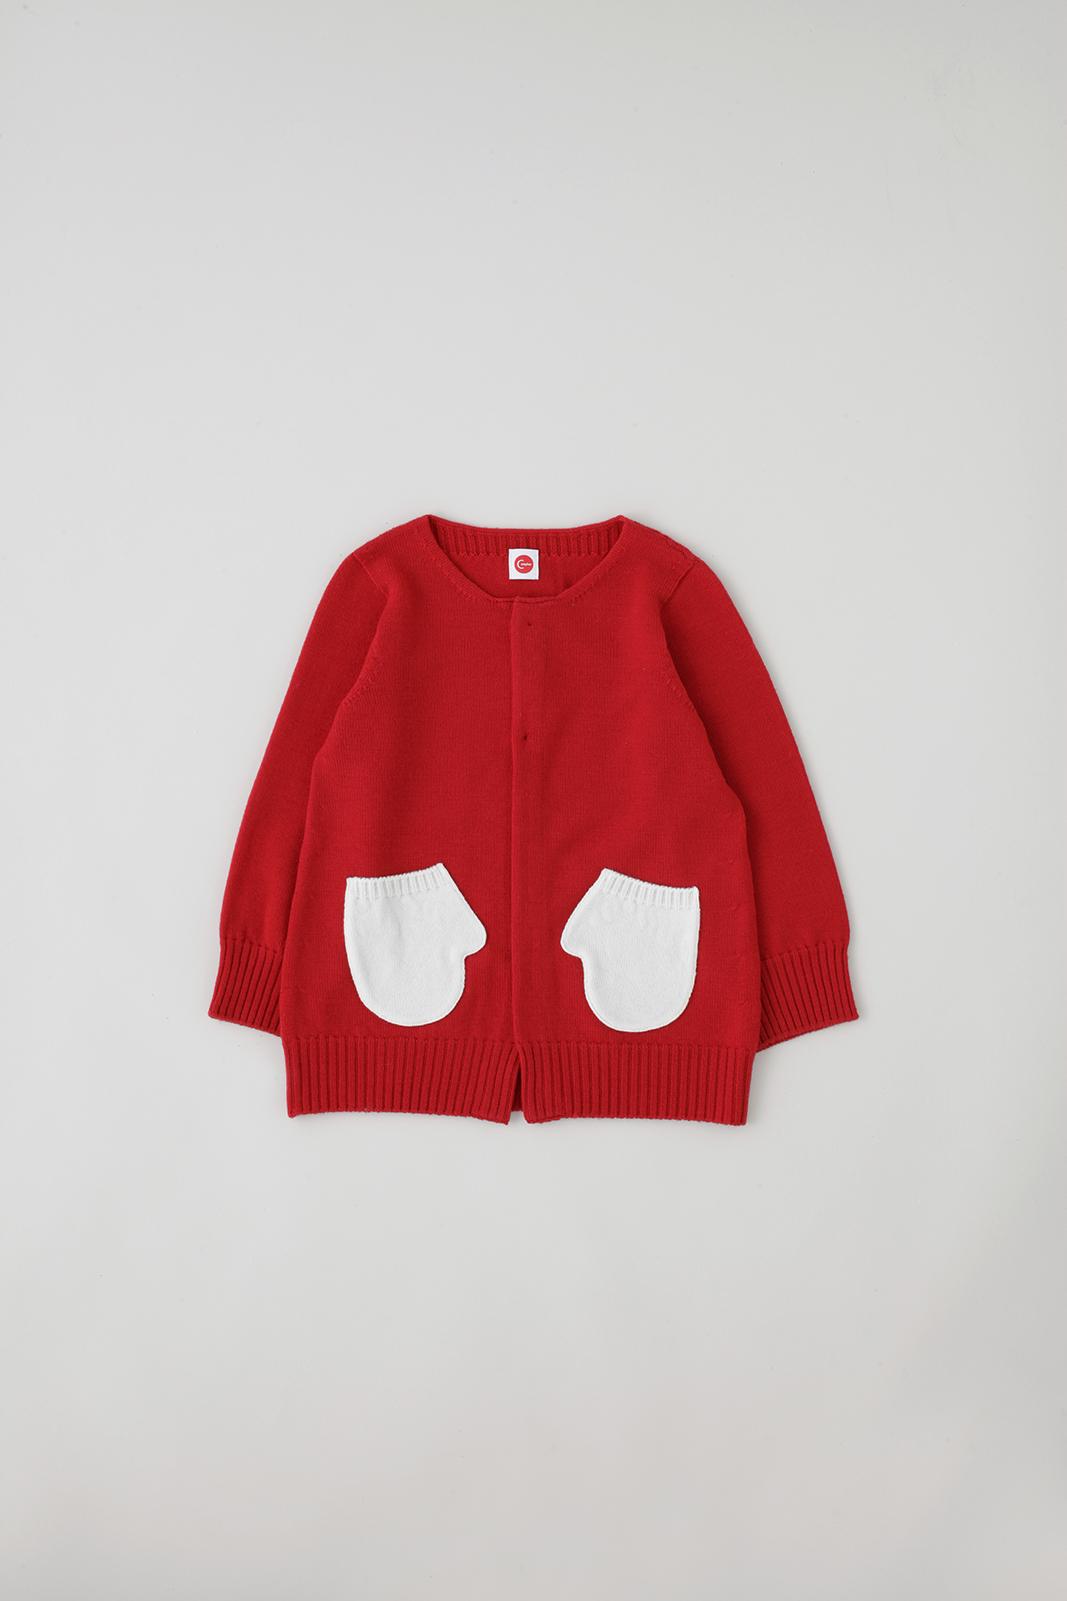 Camphor カンフル kids こども 子供服 mittencardigan 日本製 madeinjapan